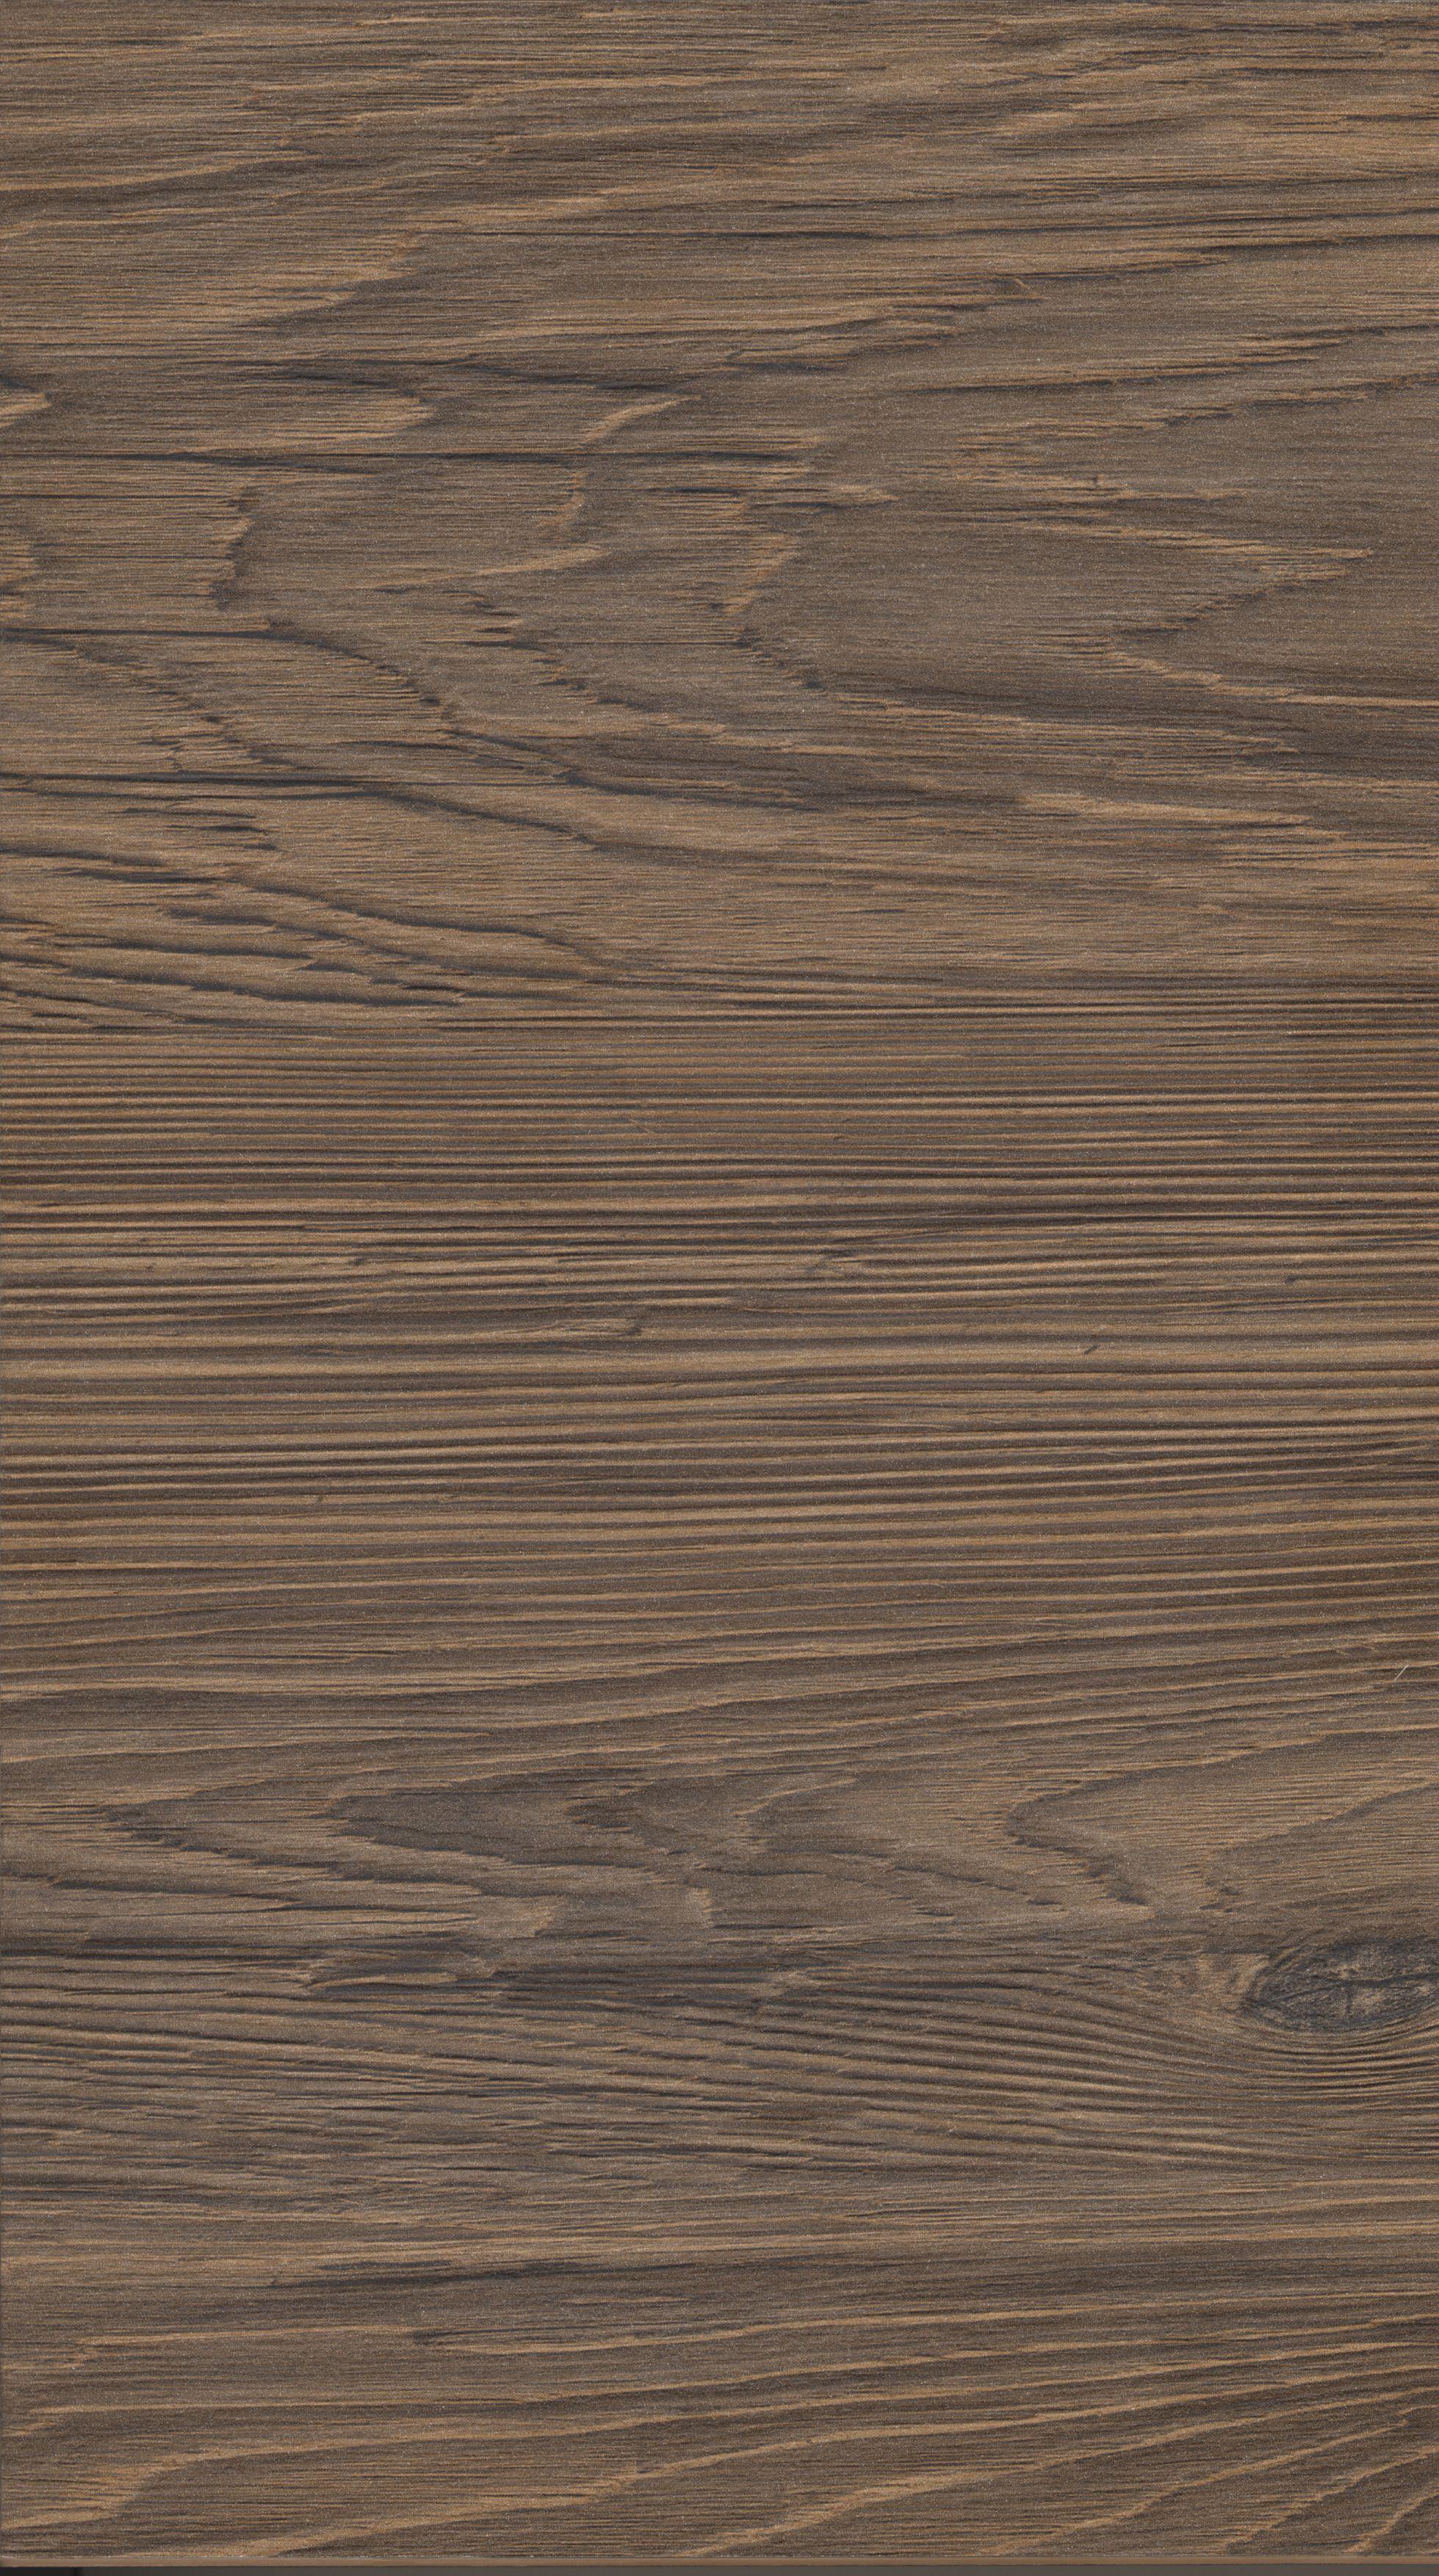 Knotted Melamine Wood Mod Nevada